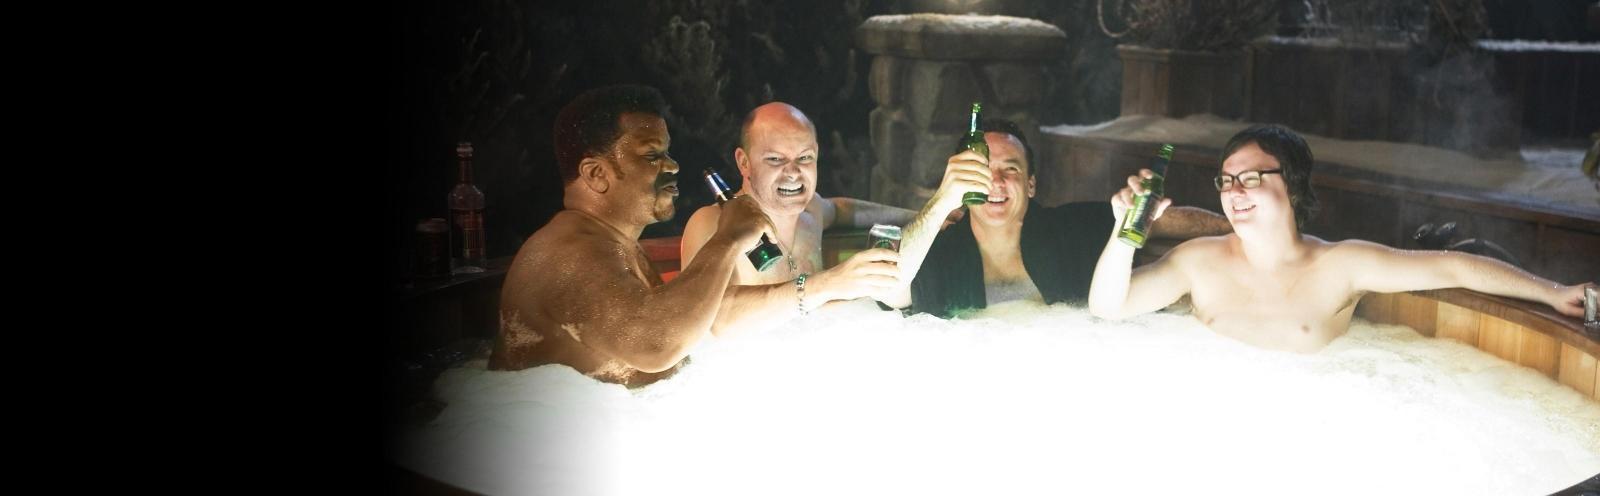 Kreisikomedia: Hot Tub Time Machine - kasarikankkunen